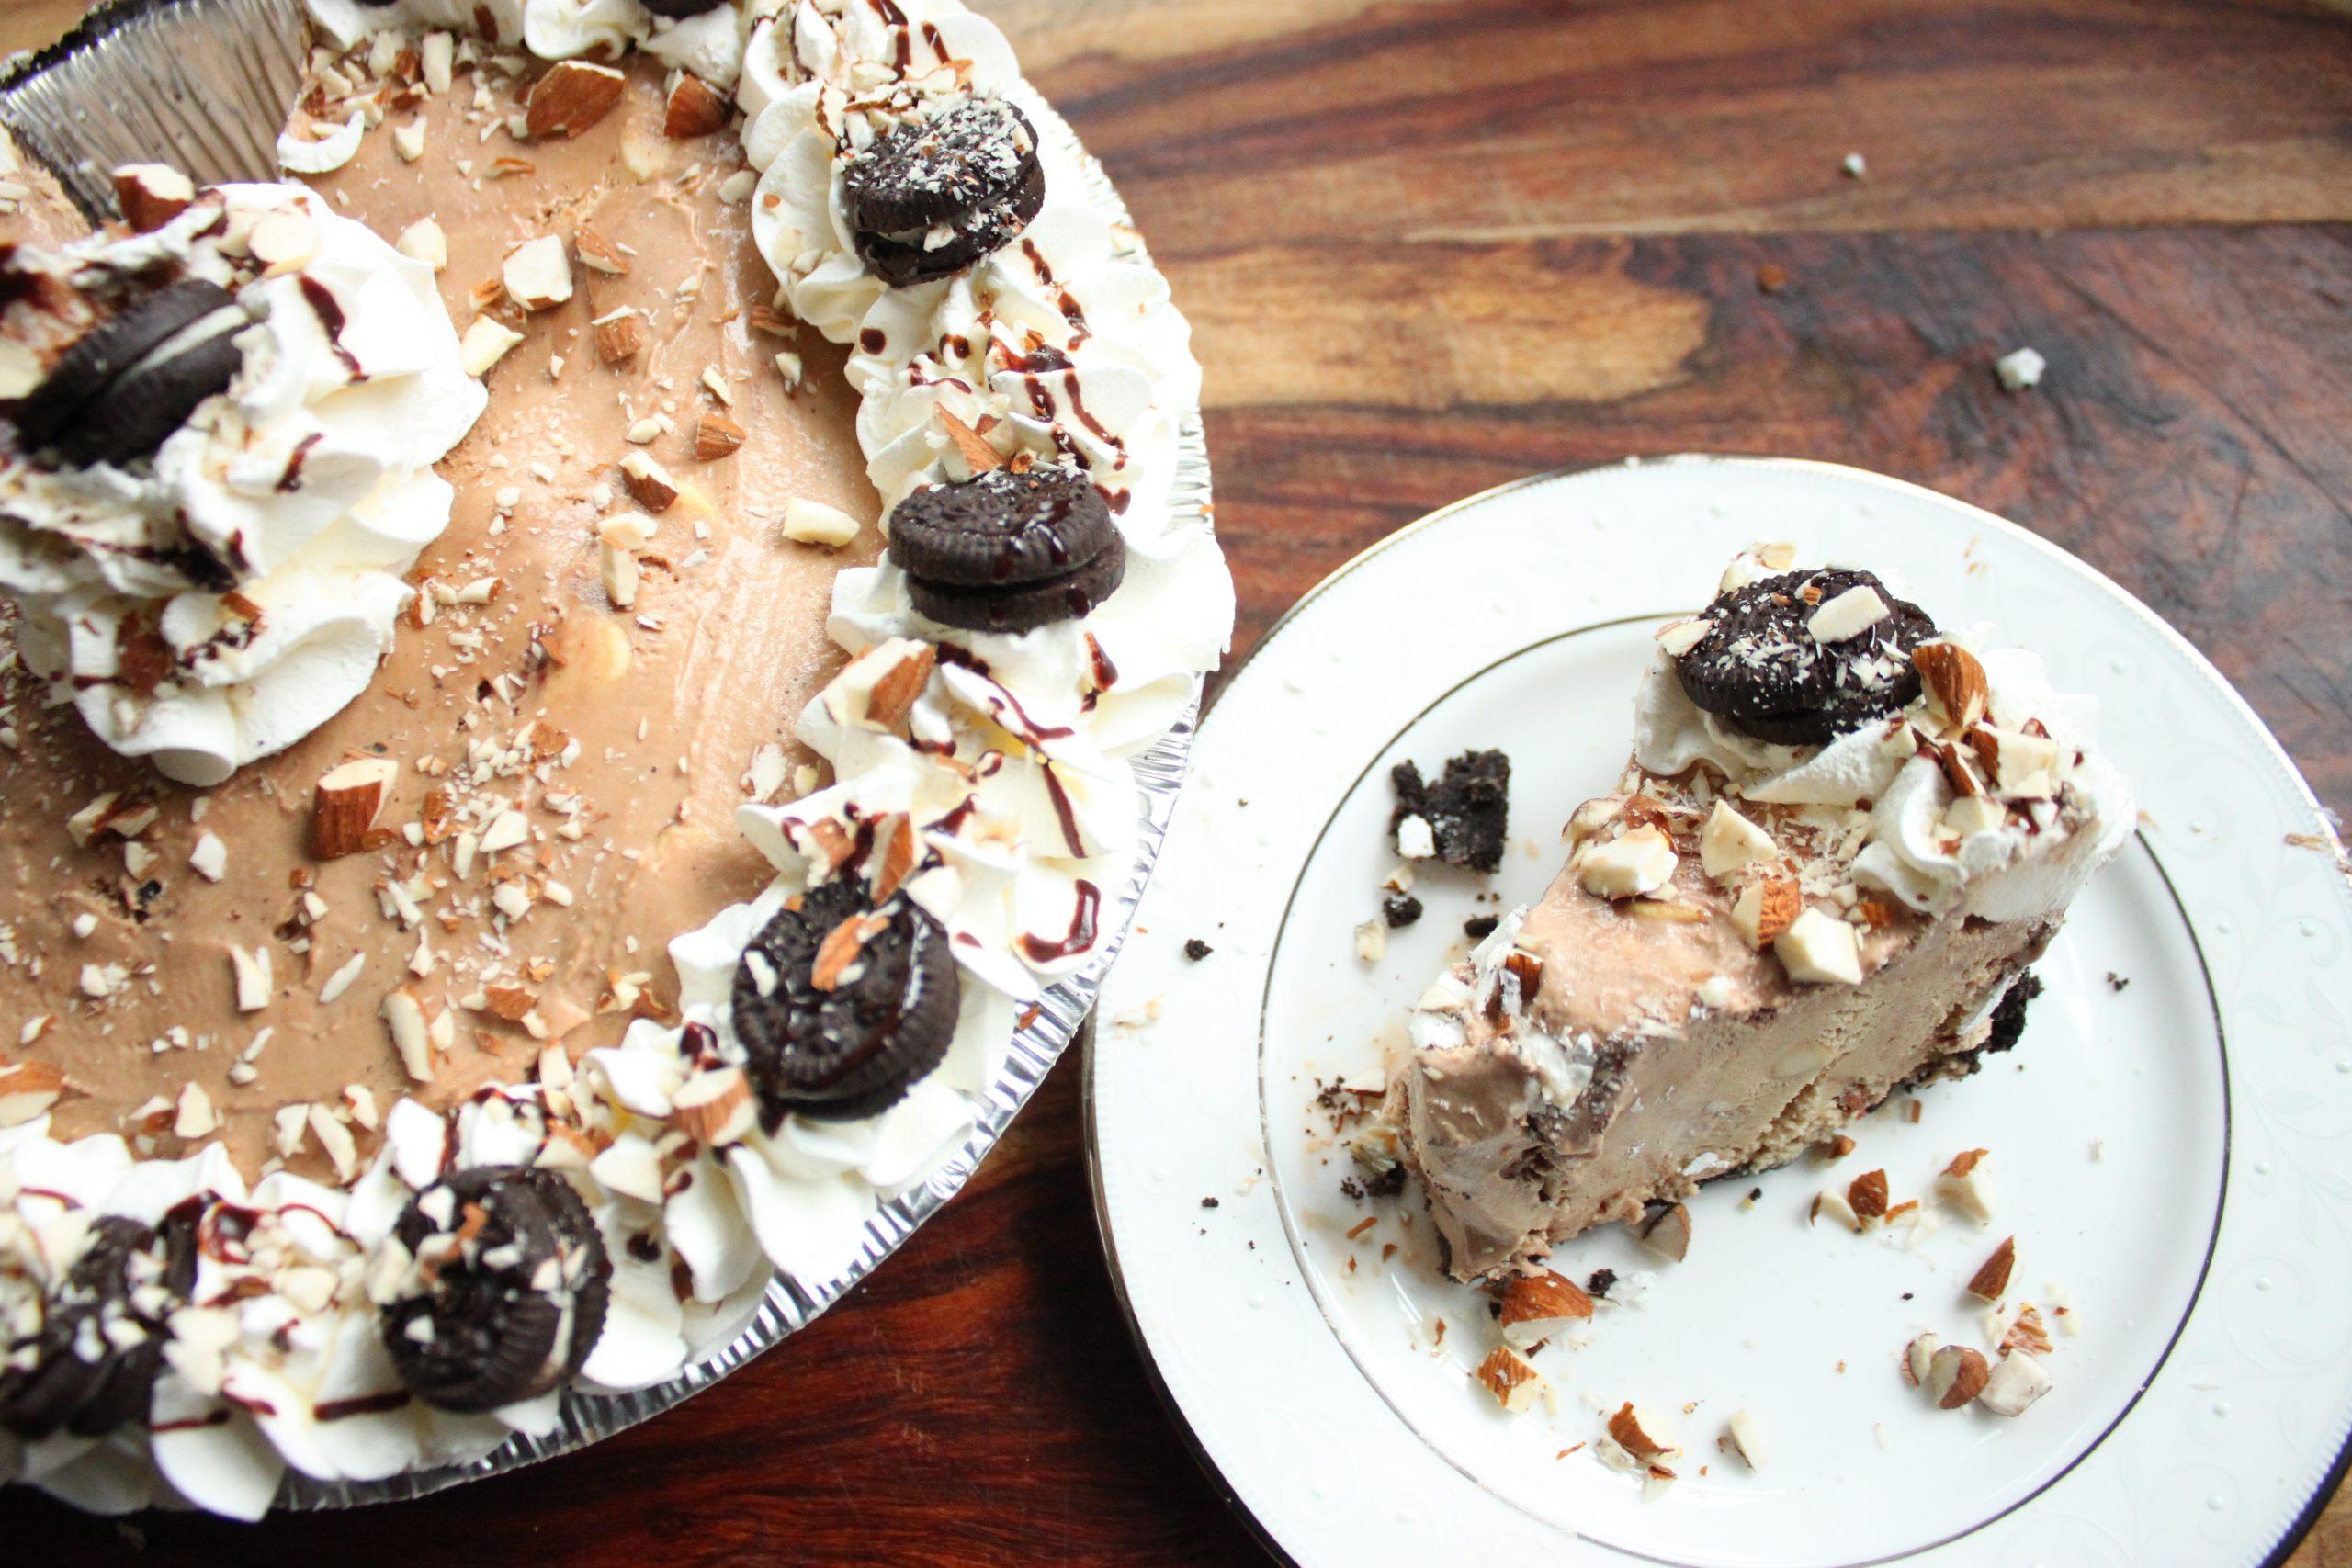 Baskin Robbins Jamoca Almond Fudge Ice Cream Pie